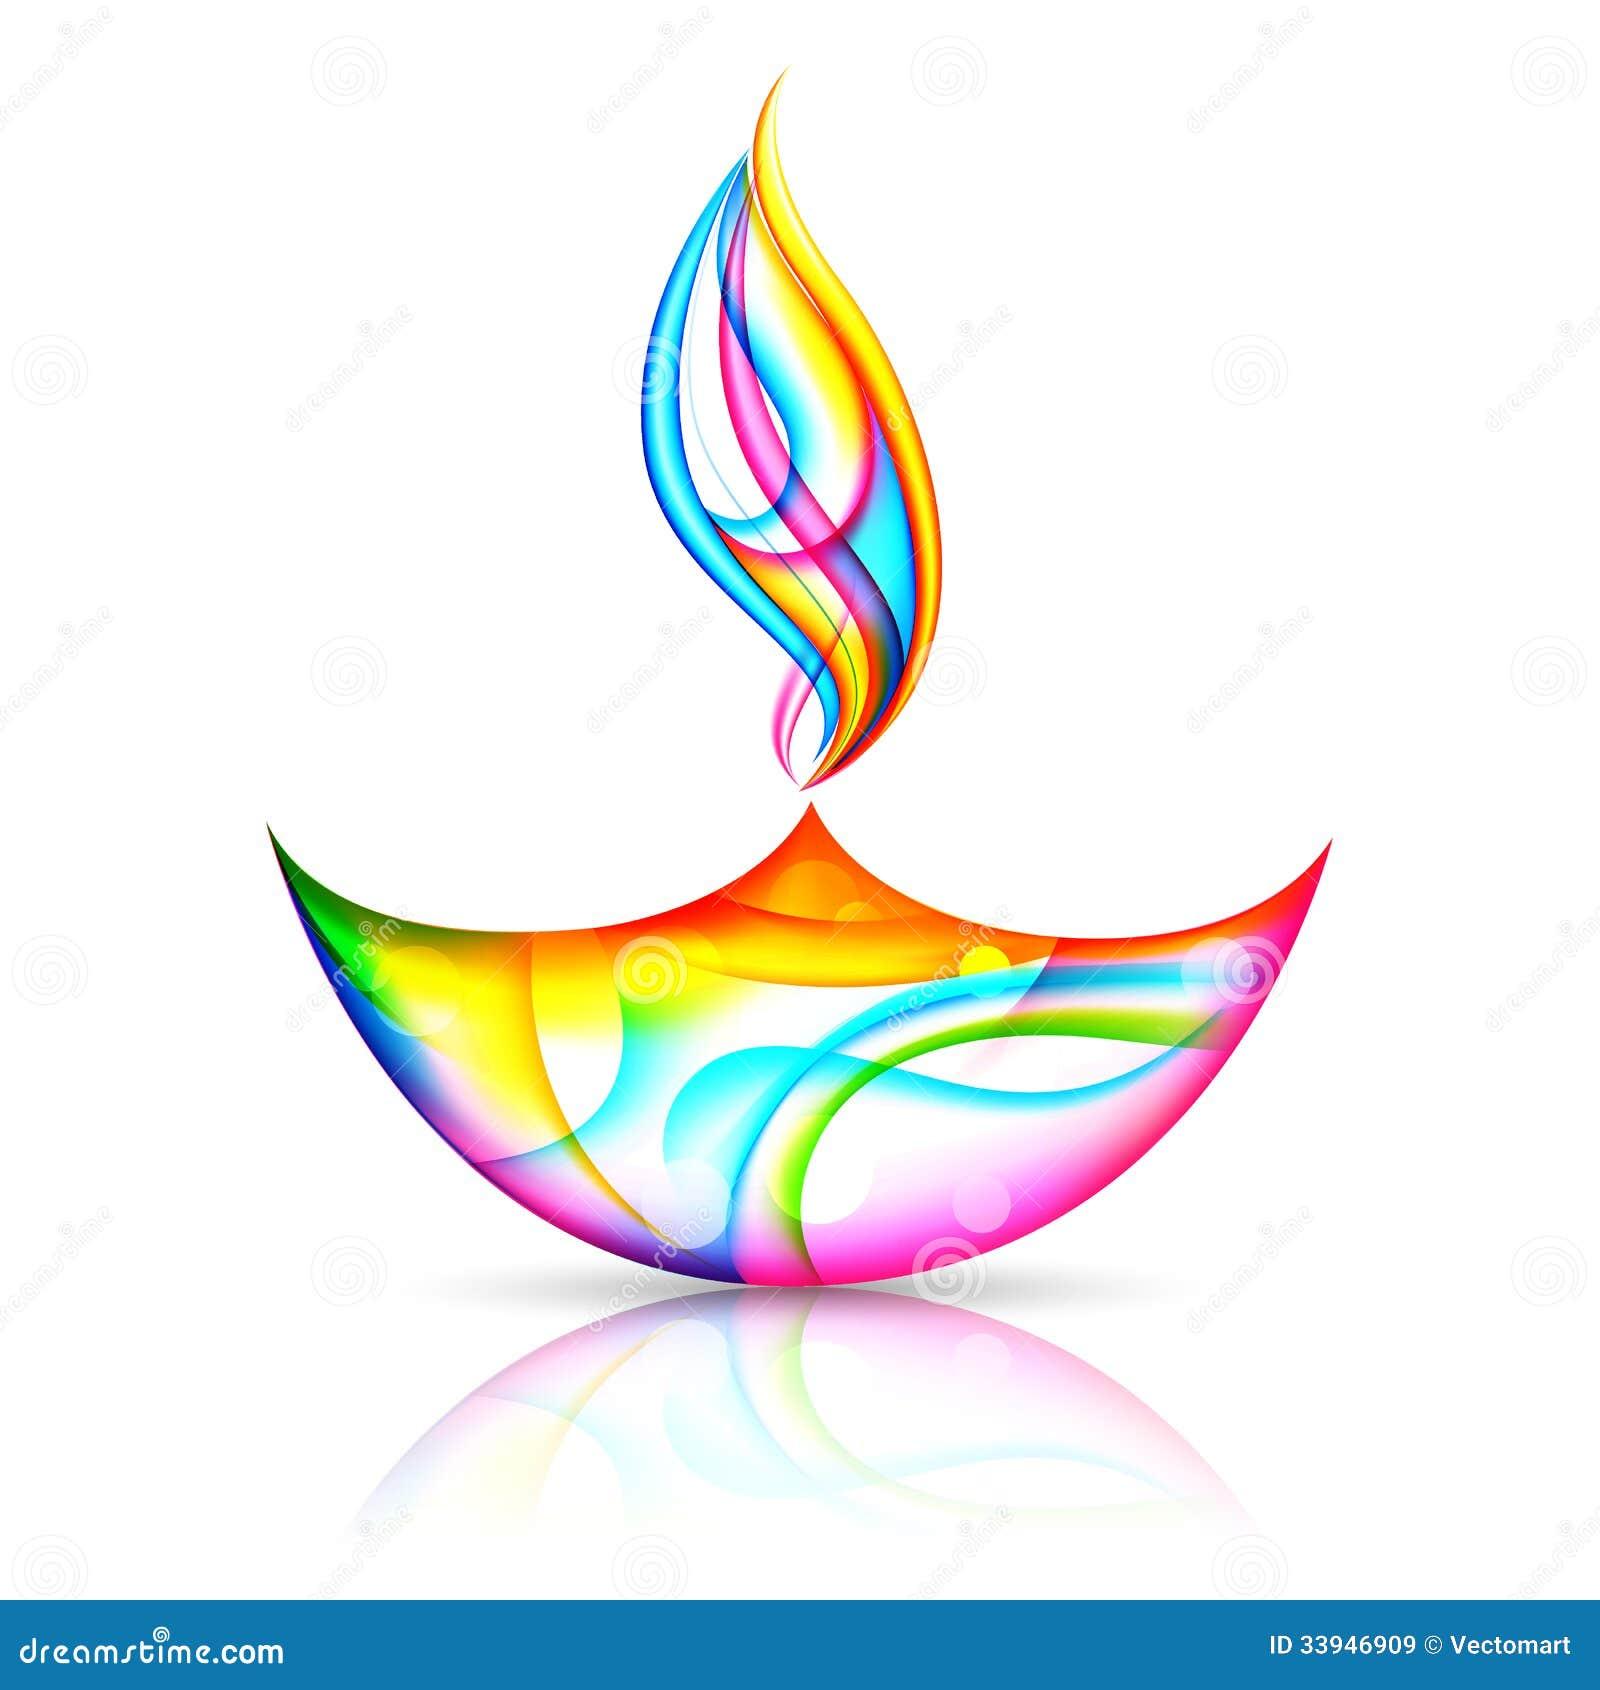 Happy Diwali Holiday Royalty Free Stock Images - Image ...